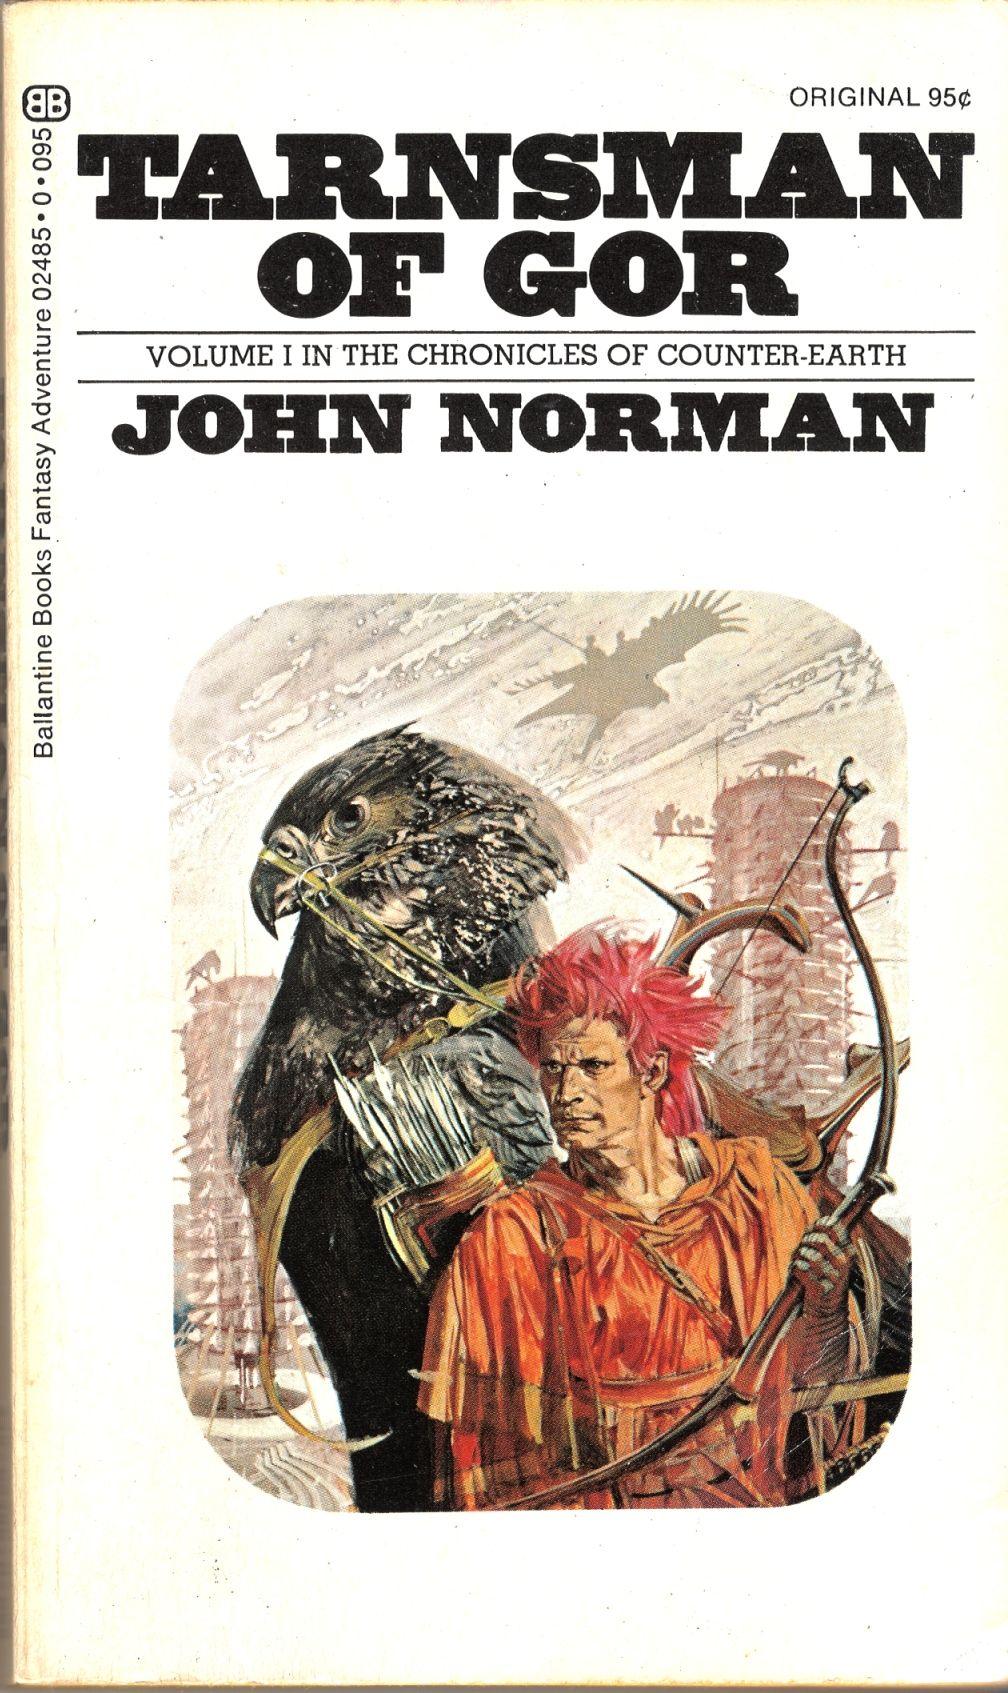 Tarnsman of gor john norman book covers pinterest robert ri tarnsman of gor john norman fandeluxe Epub